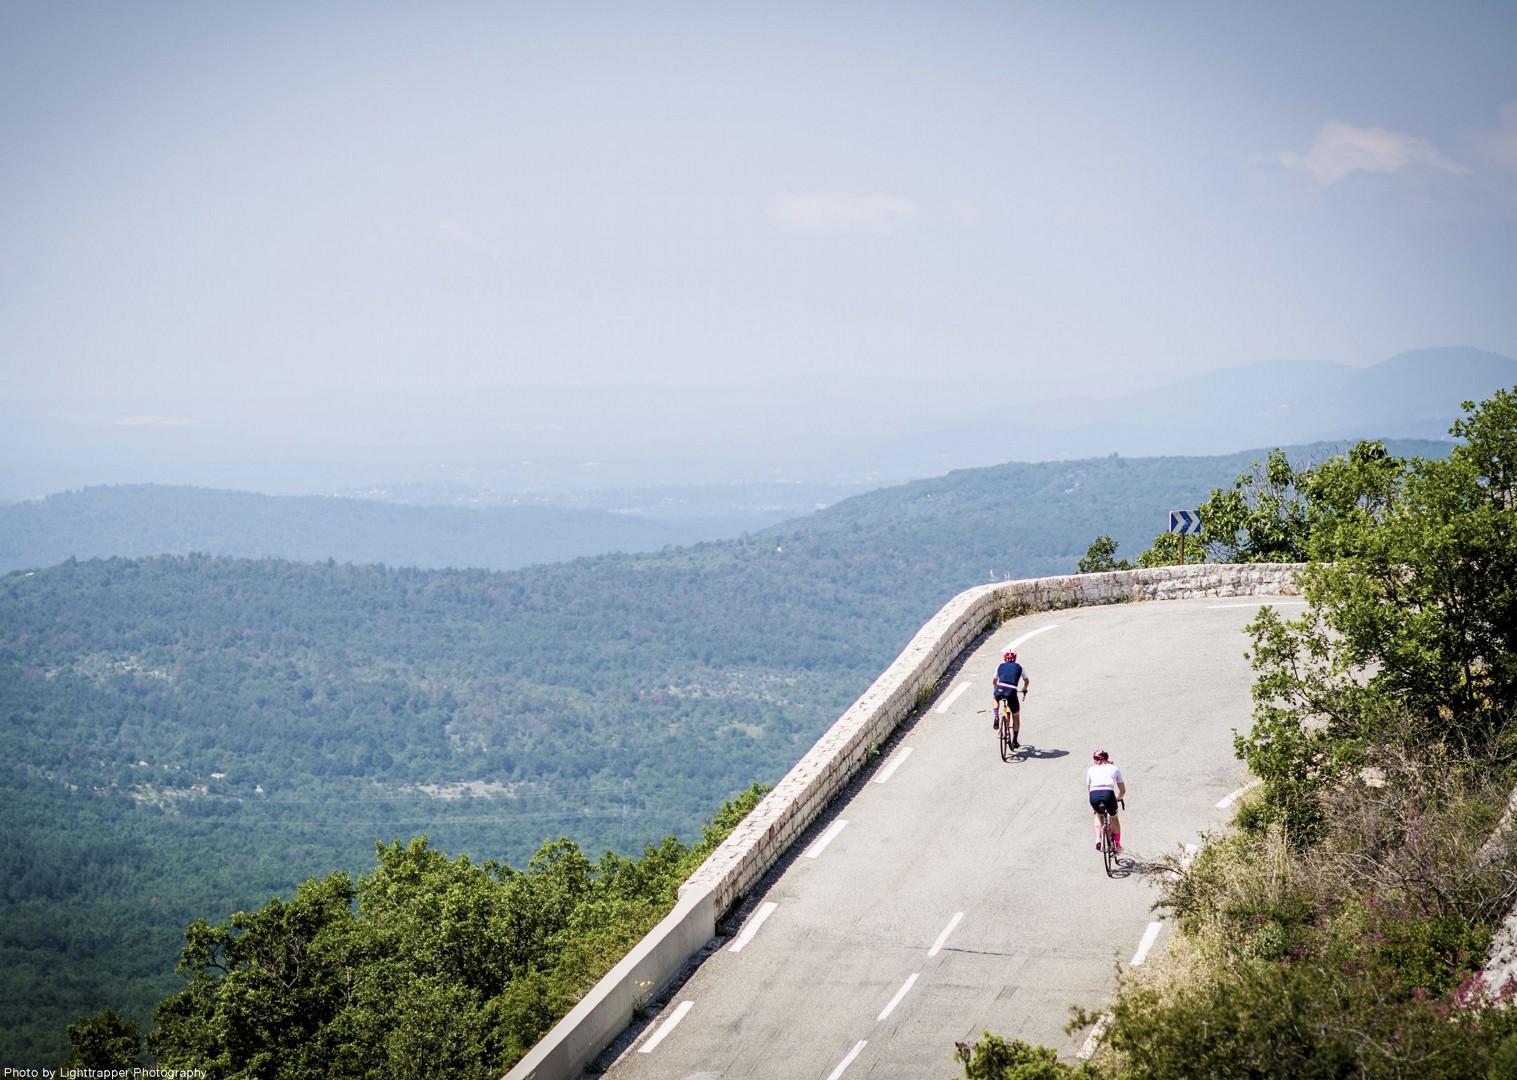 pro-cycling-col-de-la-madone-climb-cycling-road.jpg - France - Provence - Alpes Maritimes - Guided Road Cycling Holiday - Road Cycling